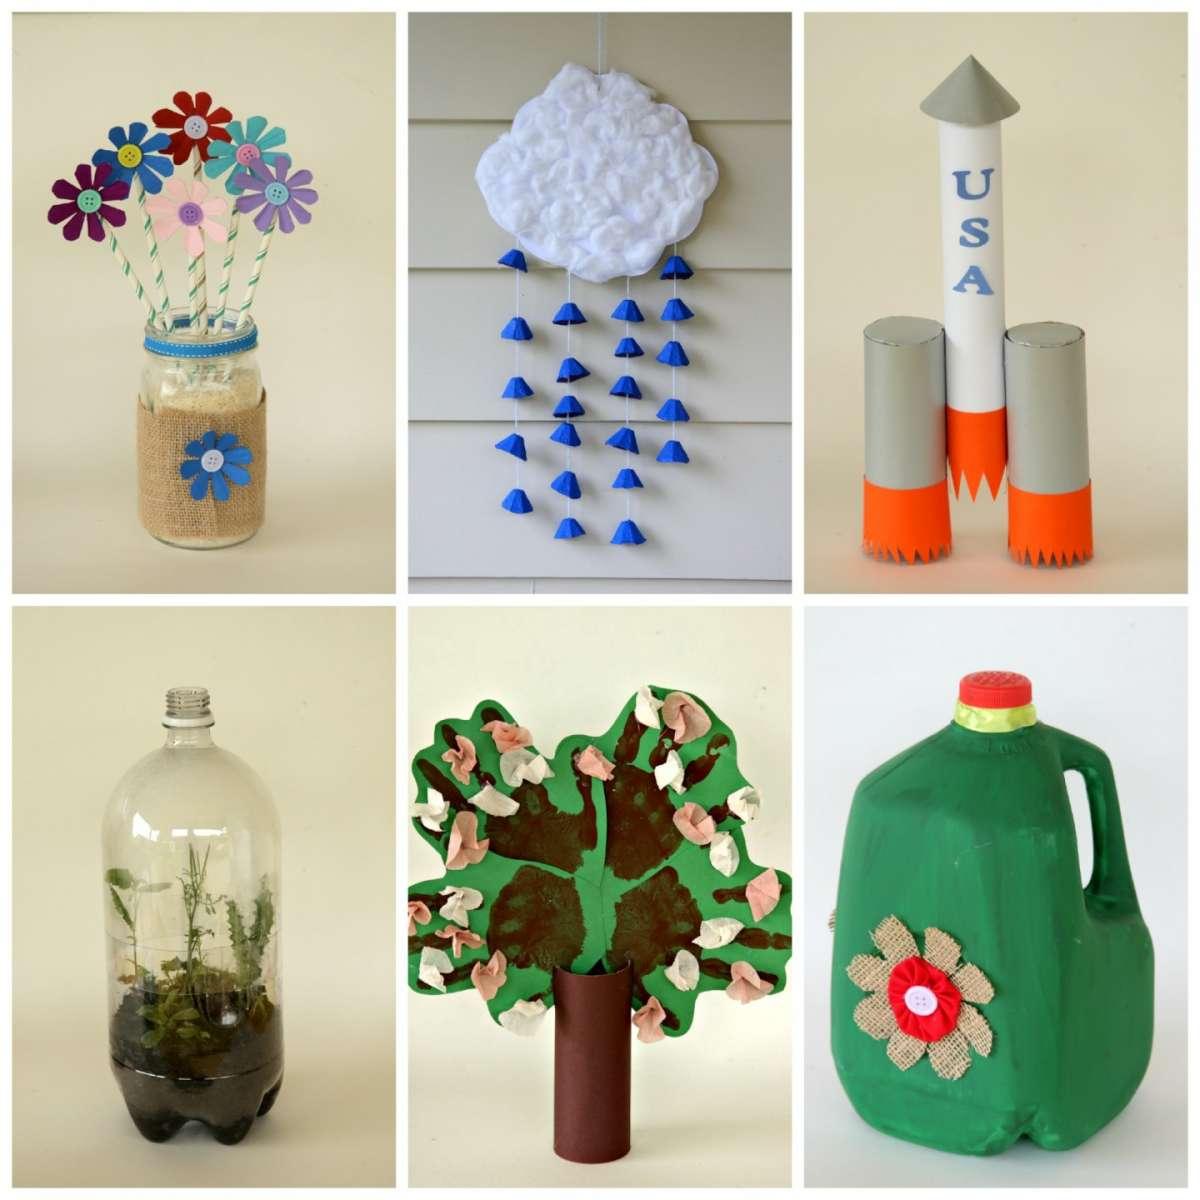 Riciclo creativo dei flaconi: idee creative